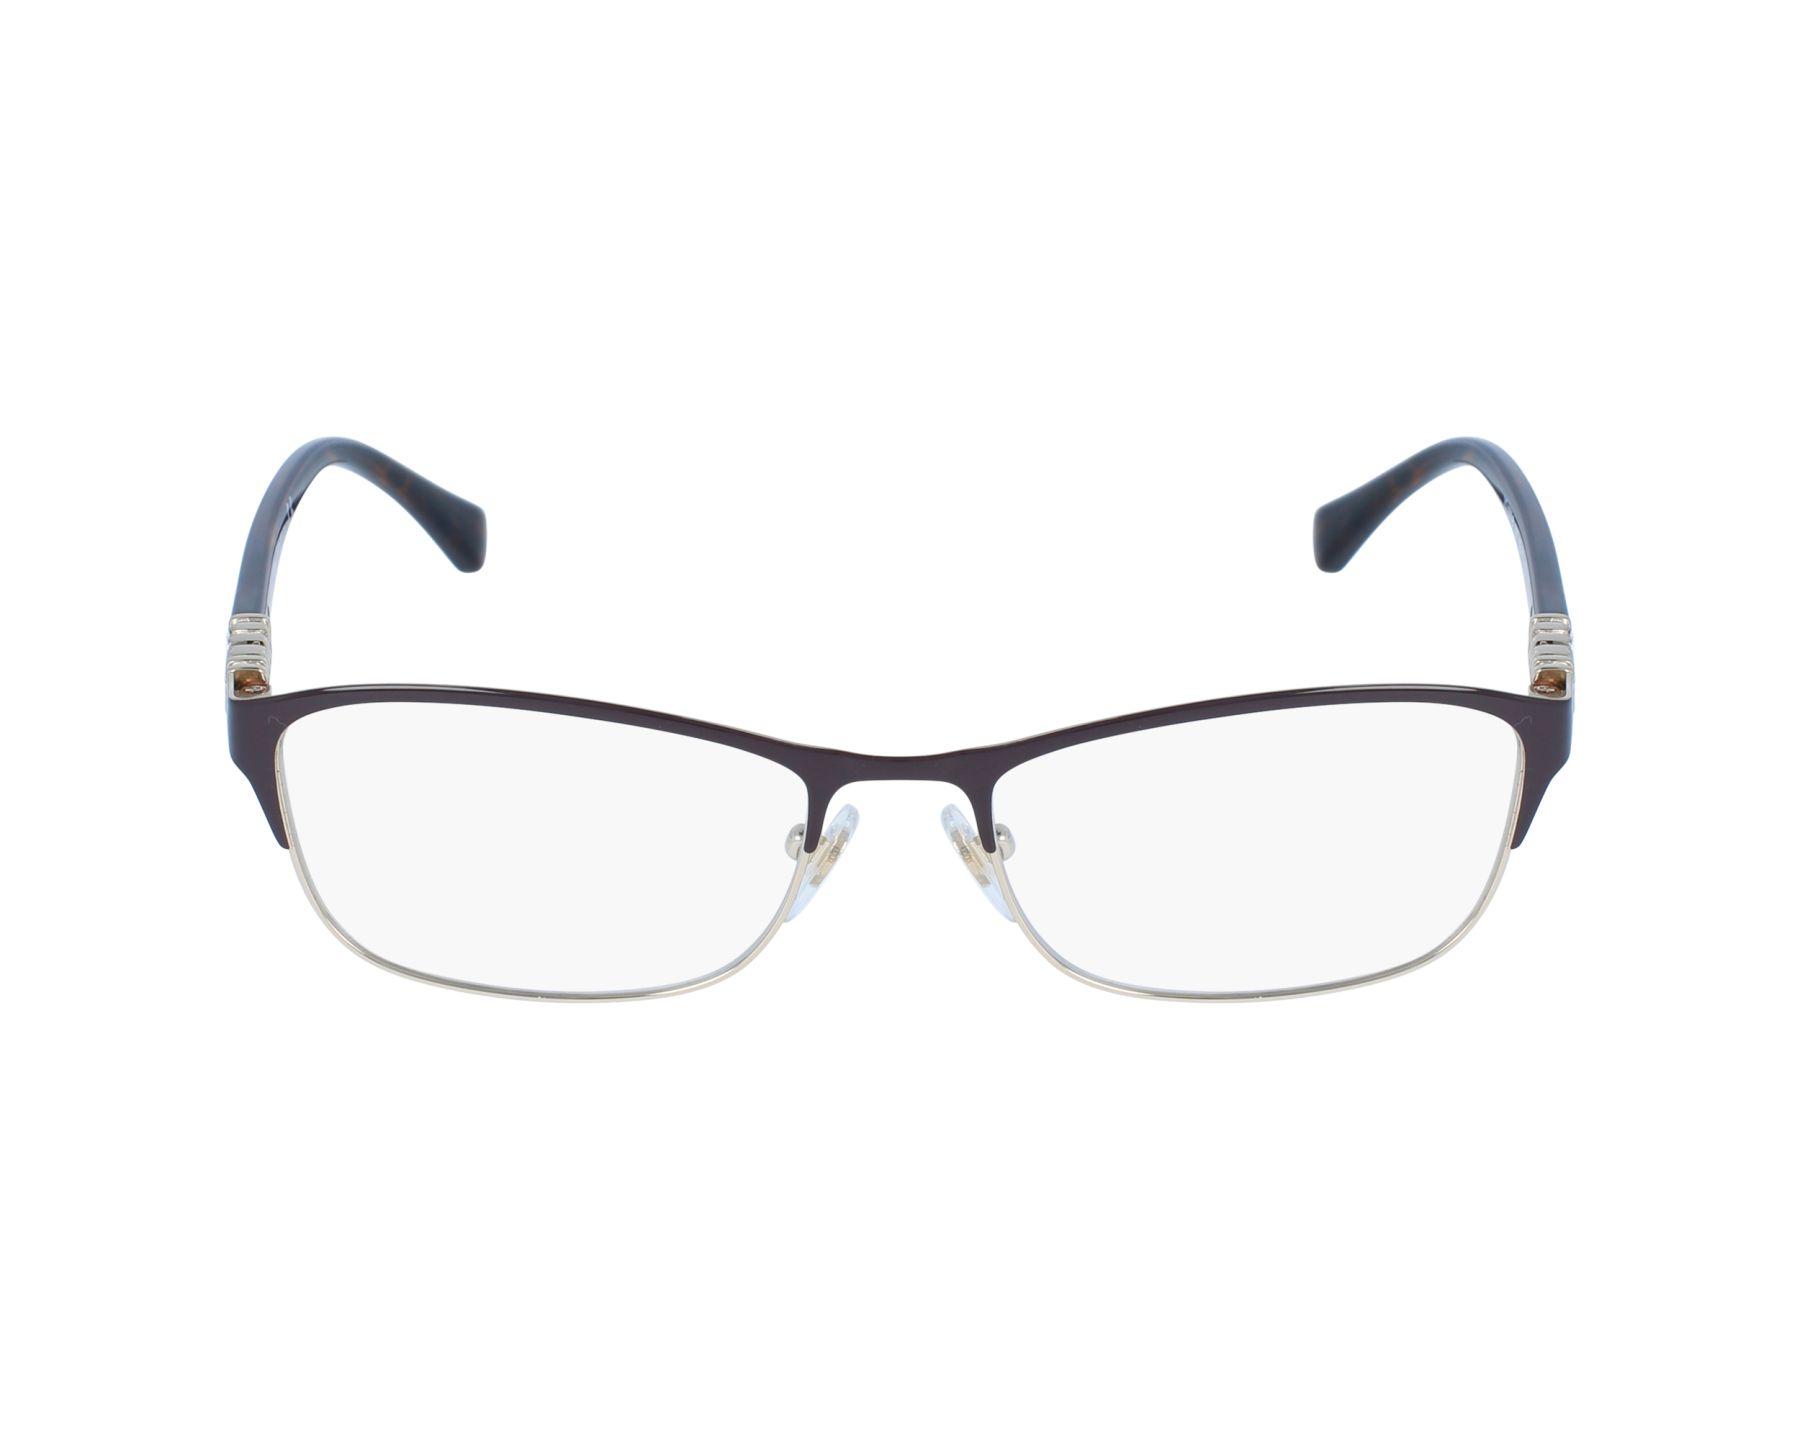 eyeglasses Vogue VO-4057-B 997 52-17 Brown Gold profile view 47784d25c15